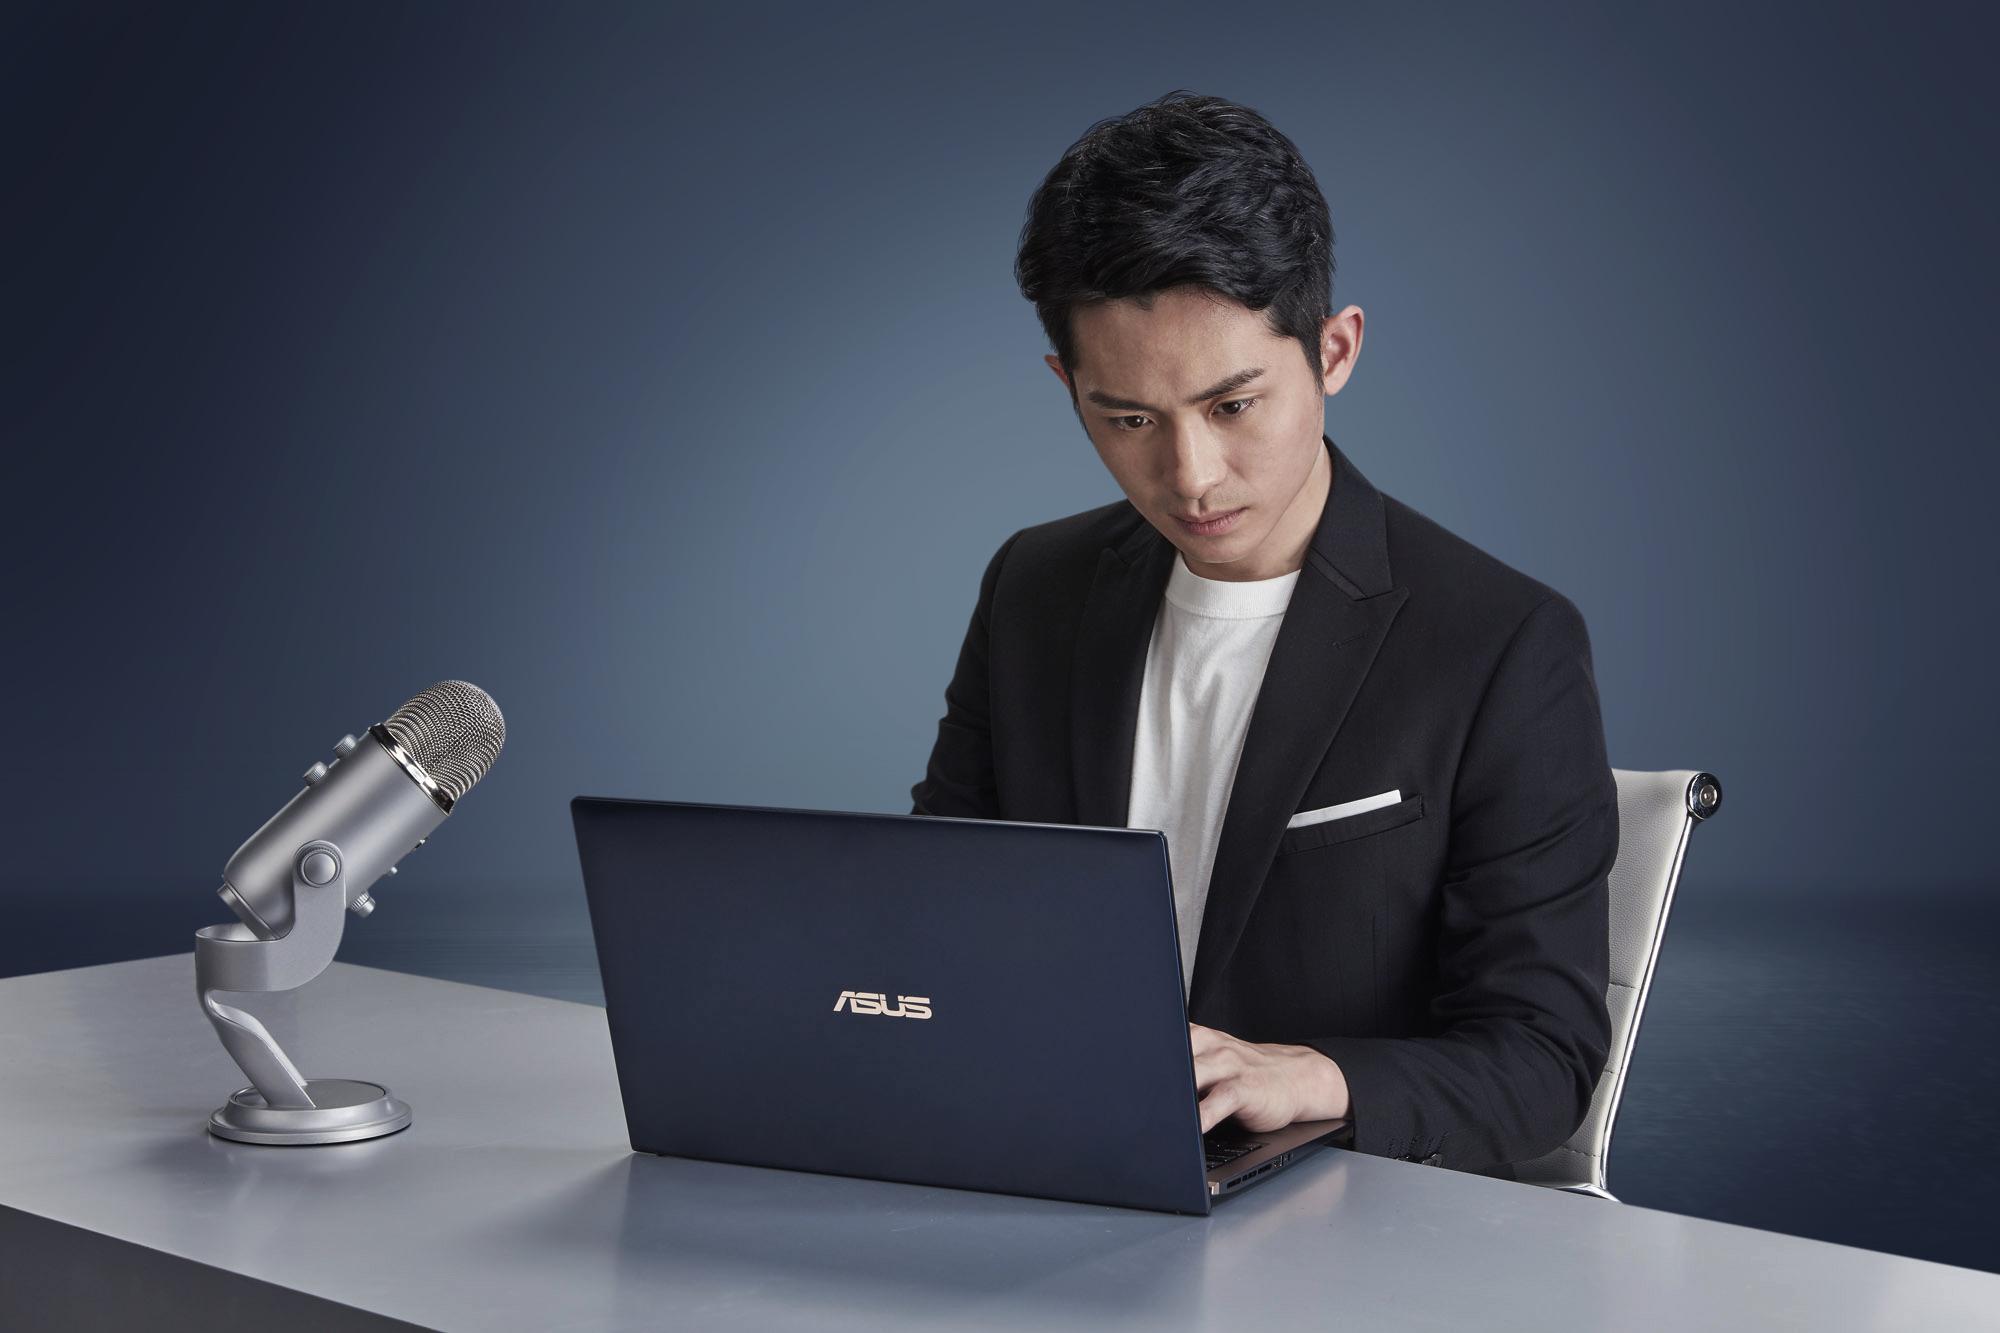 ASUS ZenBook推薦大使,分享人生理念、堅持夢想的過程,系列影片預計3月21日起首播。